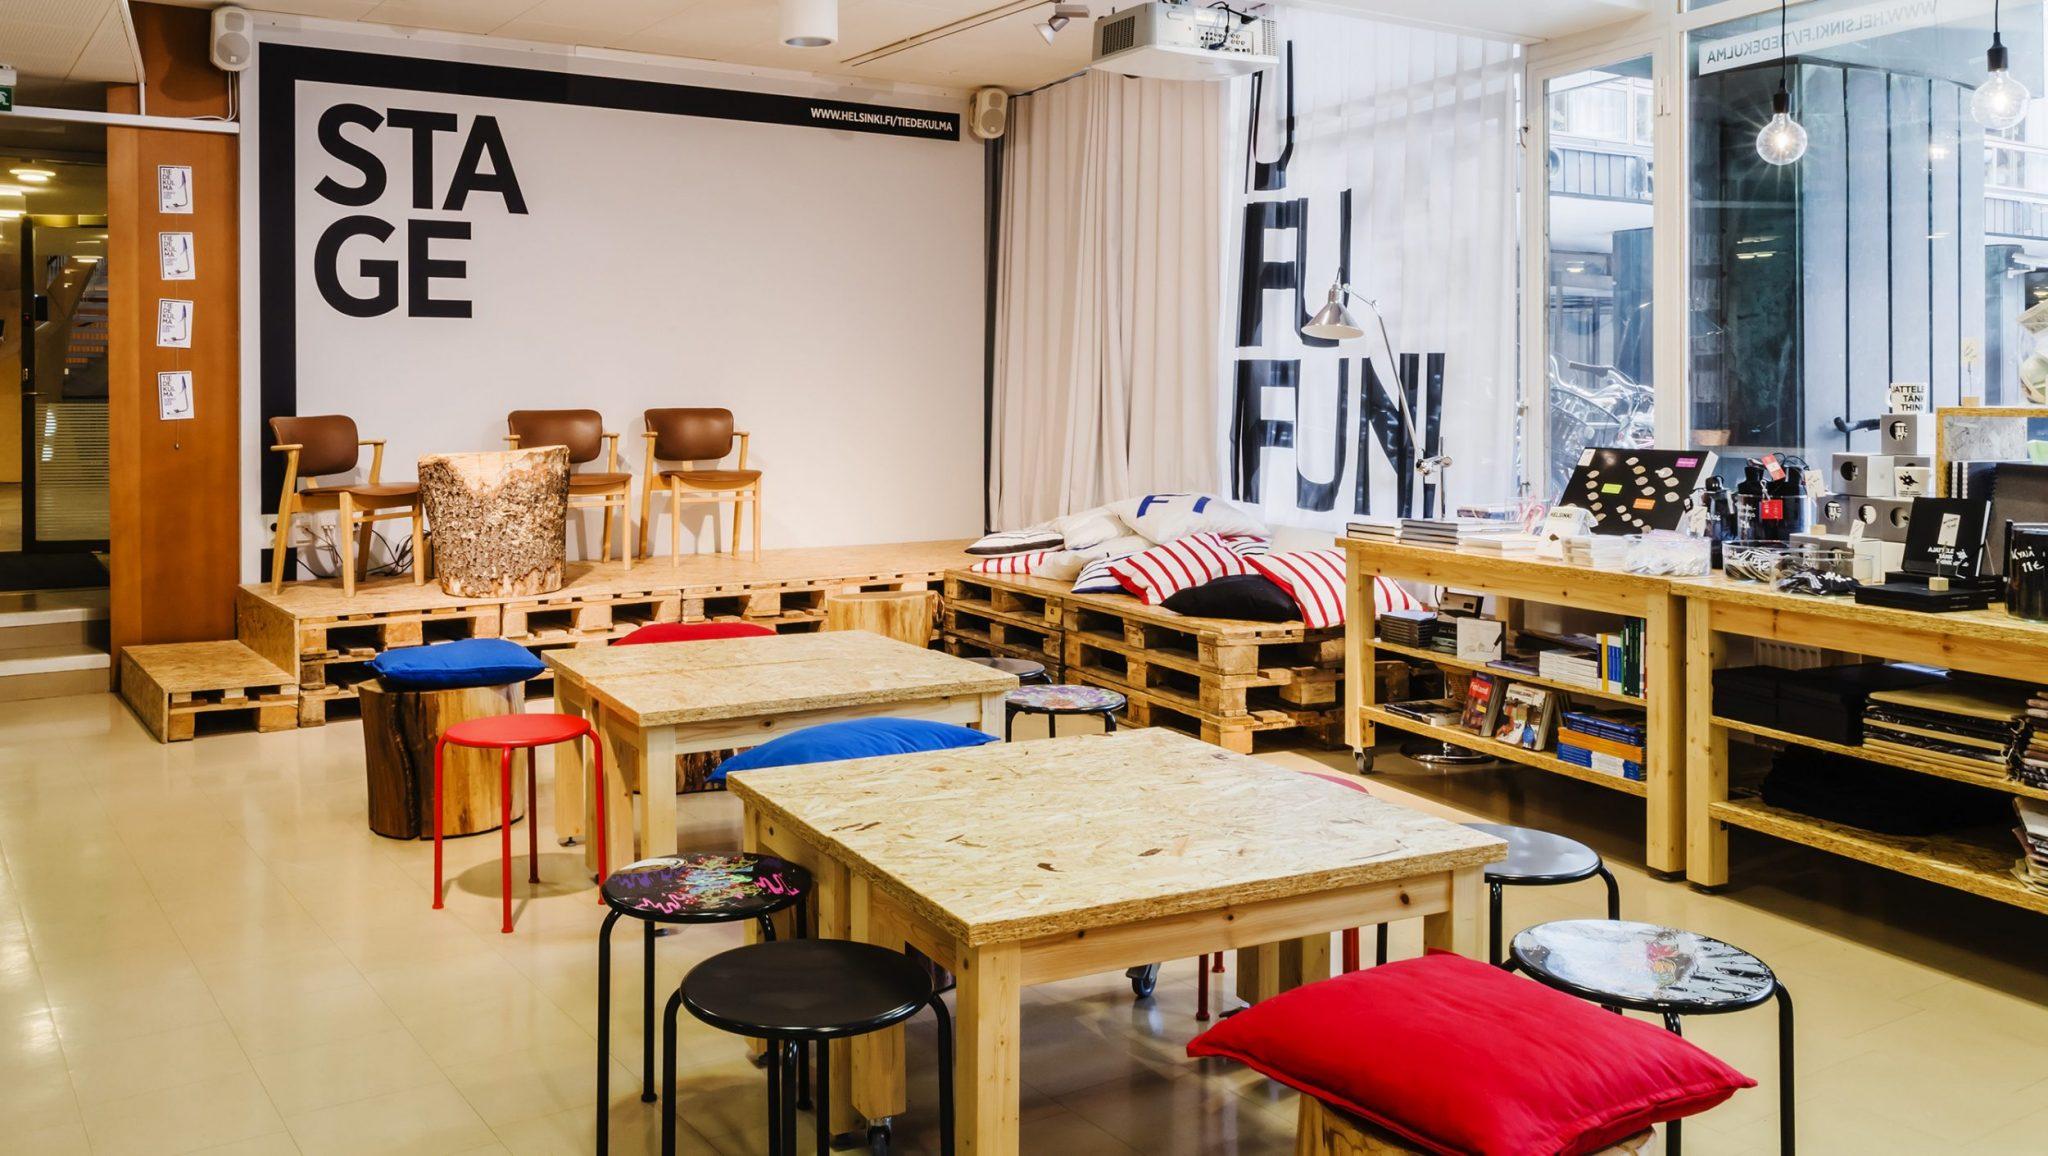 Think-Corner-pop-up-store-Aleksanterinkatu-Helsinki-GI-Project-6